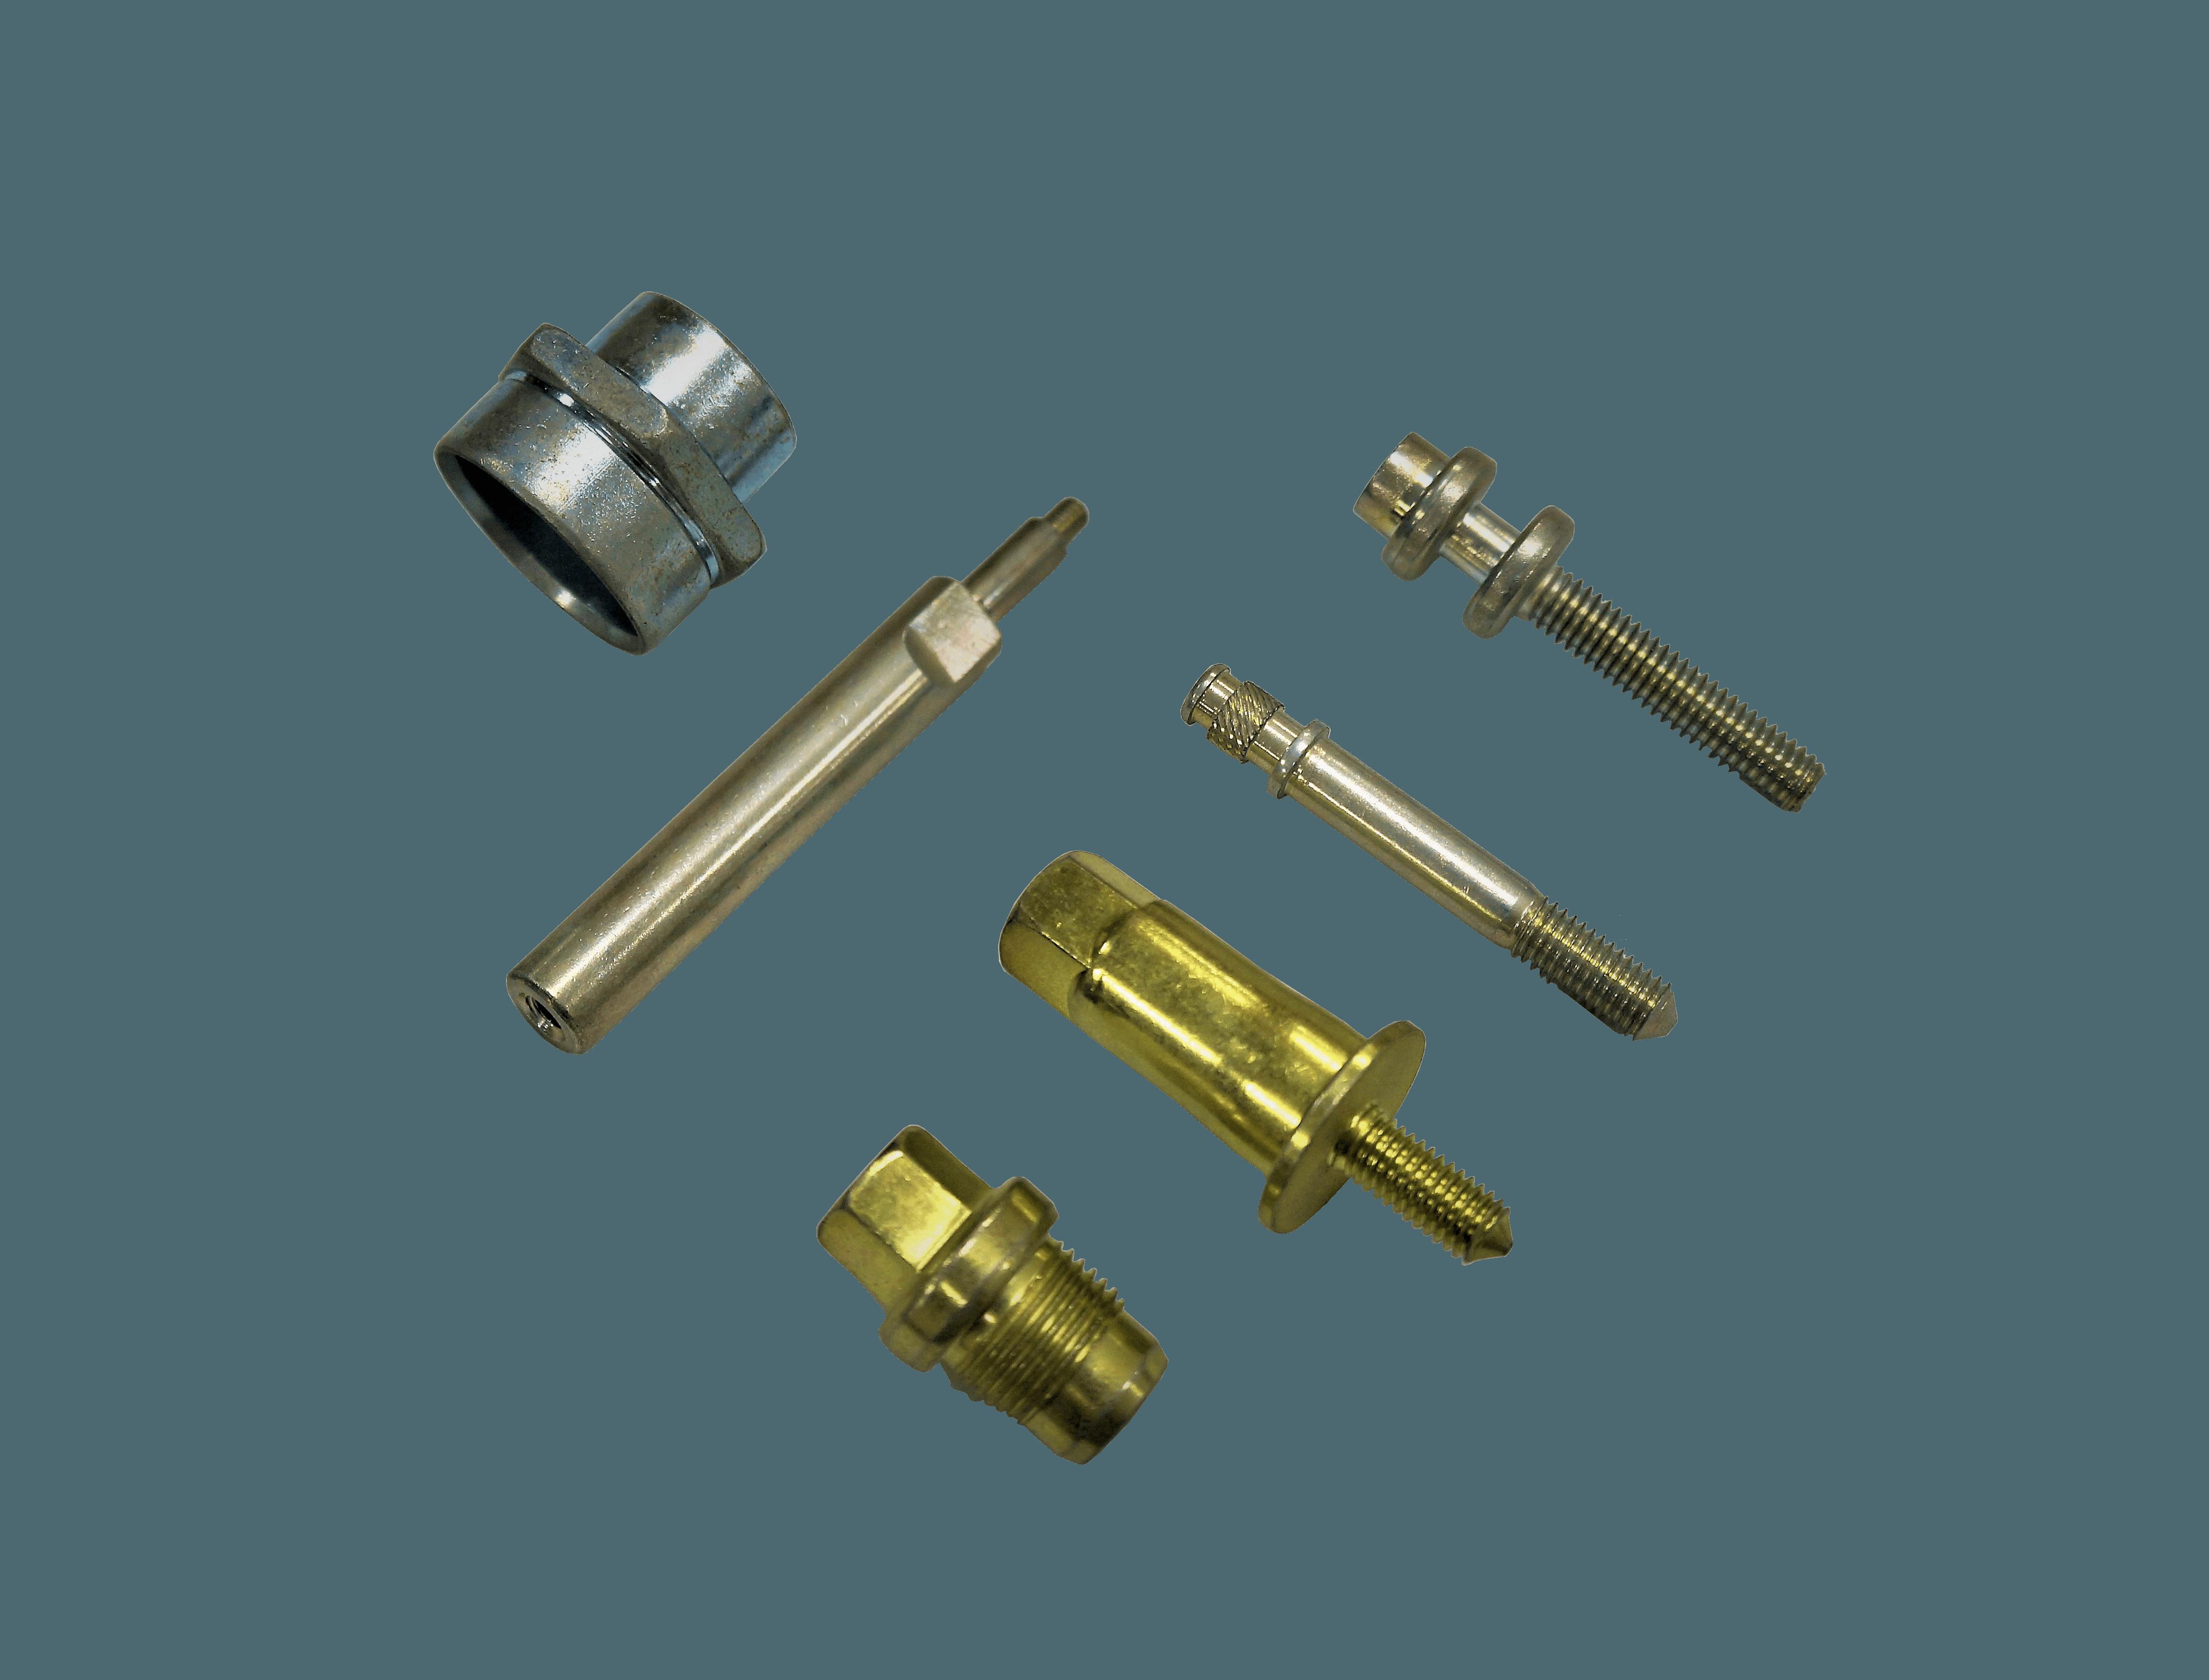 4x4 Pick Up Screw for Vehicle Fastener made by Sunny Screw Industry 三能螺栓工業股份有限公司 - MatchSupplier.com